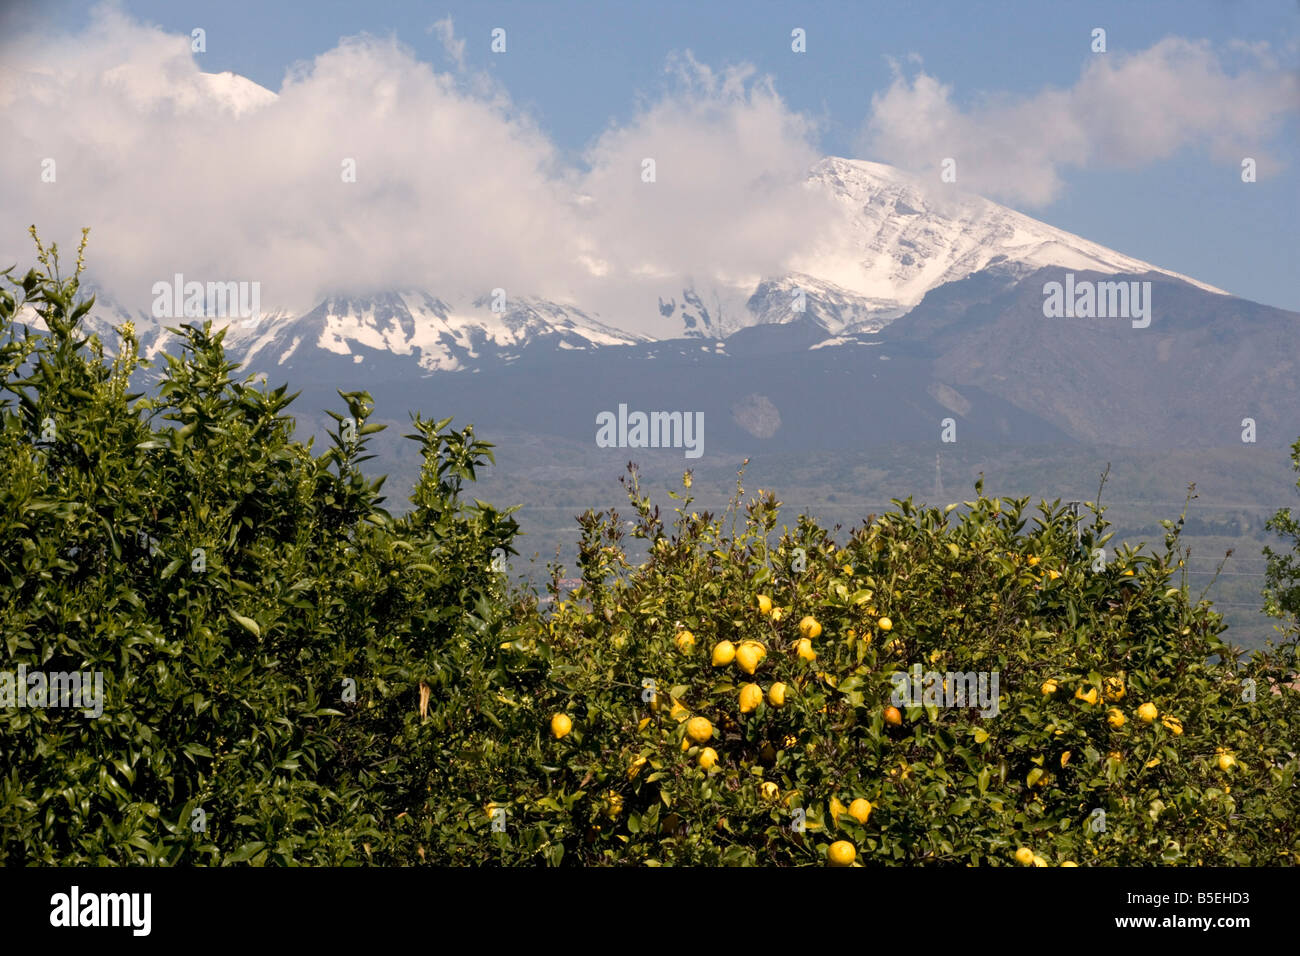 Lemons growing below the snows of Mount Etna Sicily - Stock Image